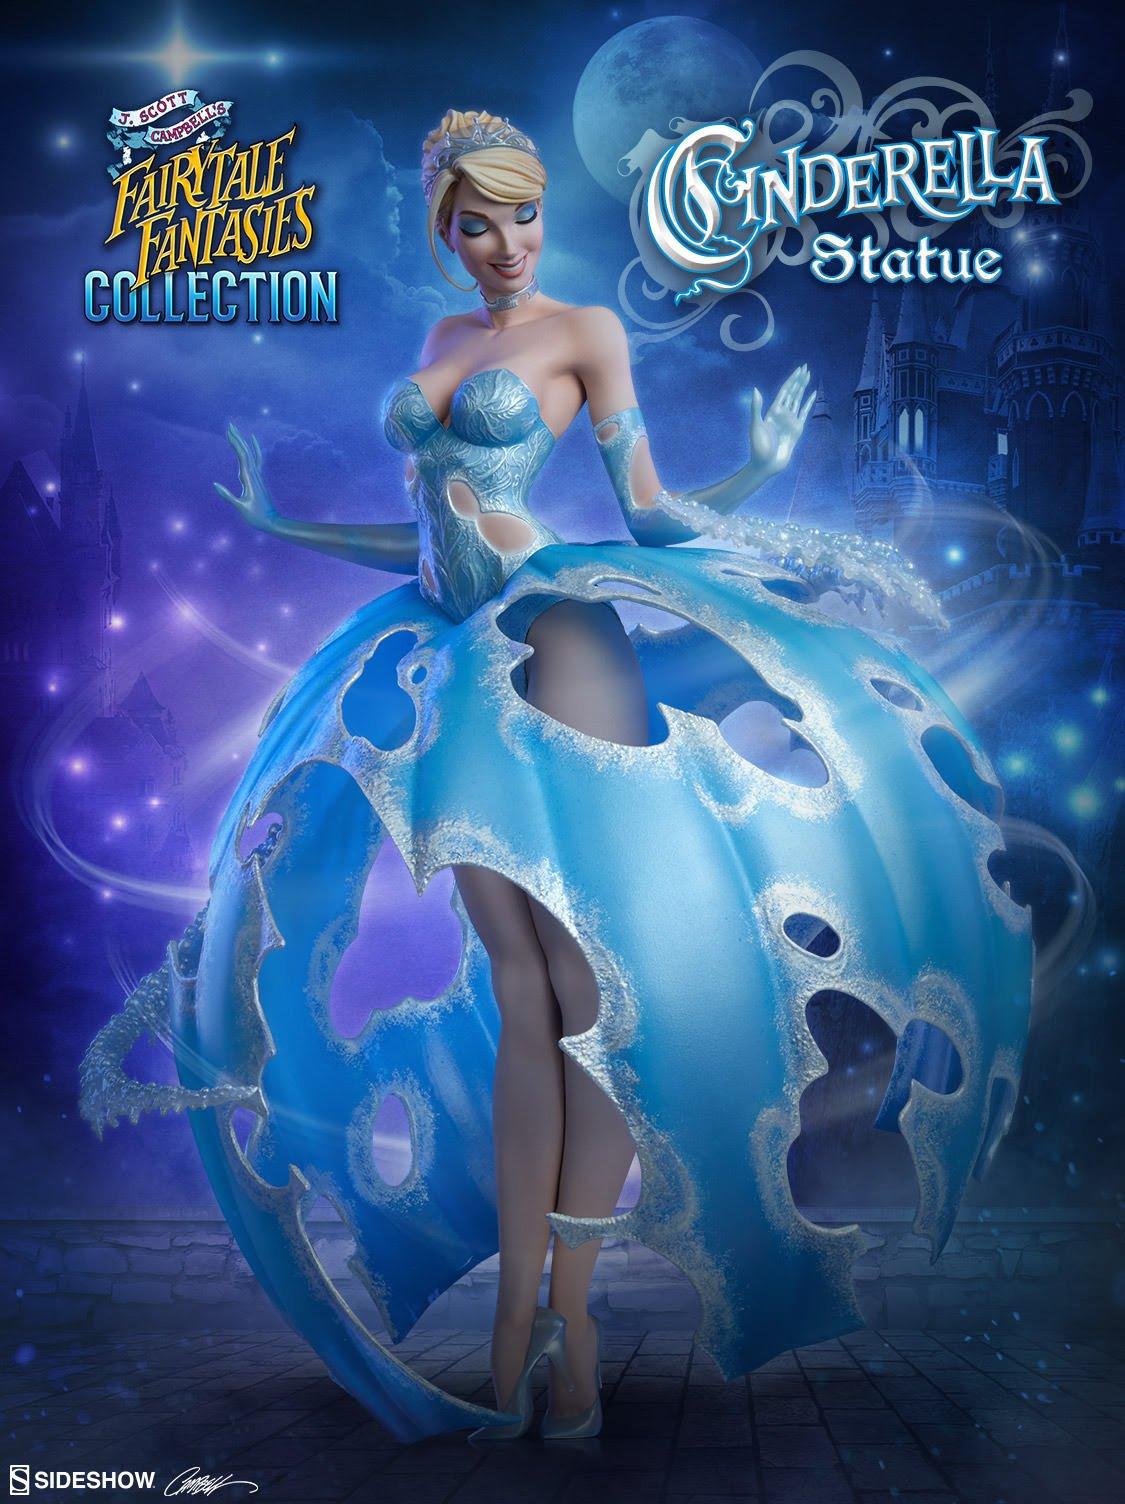 Cinderella Statue by Sideshow